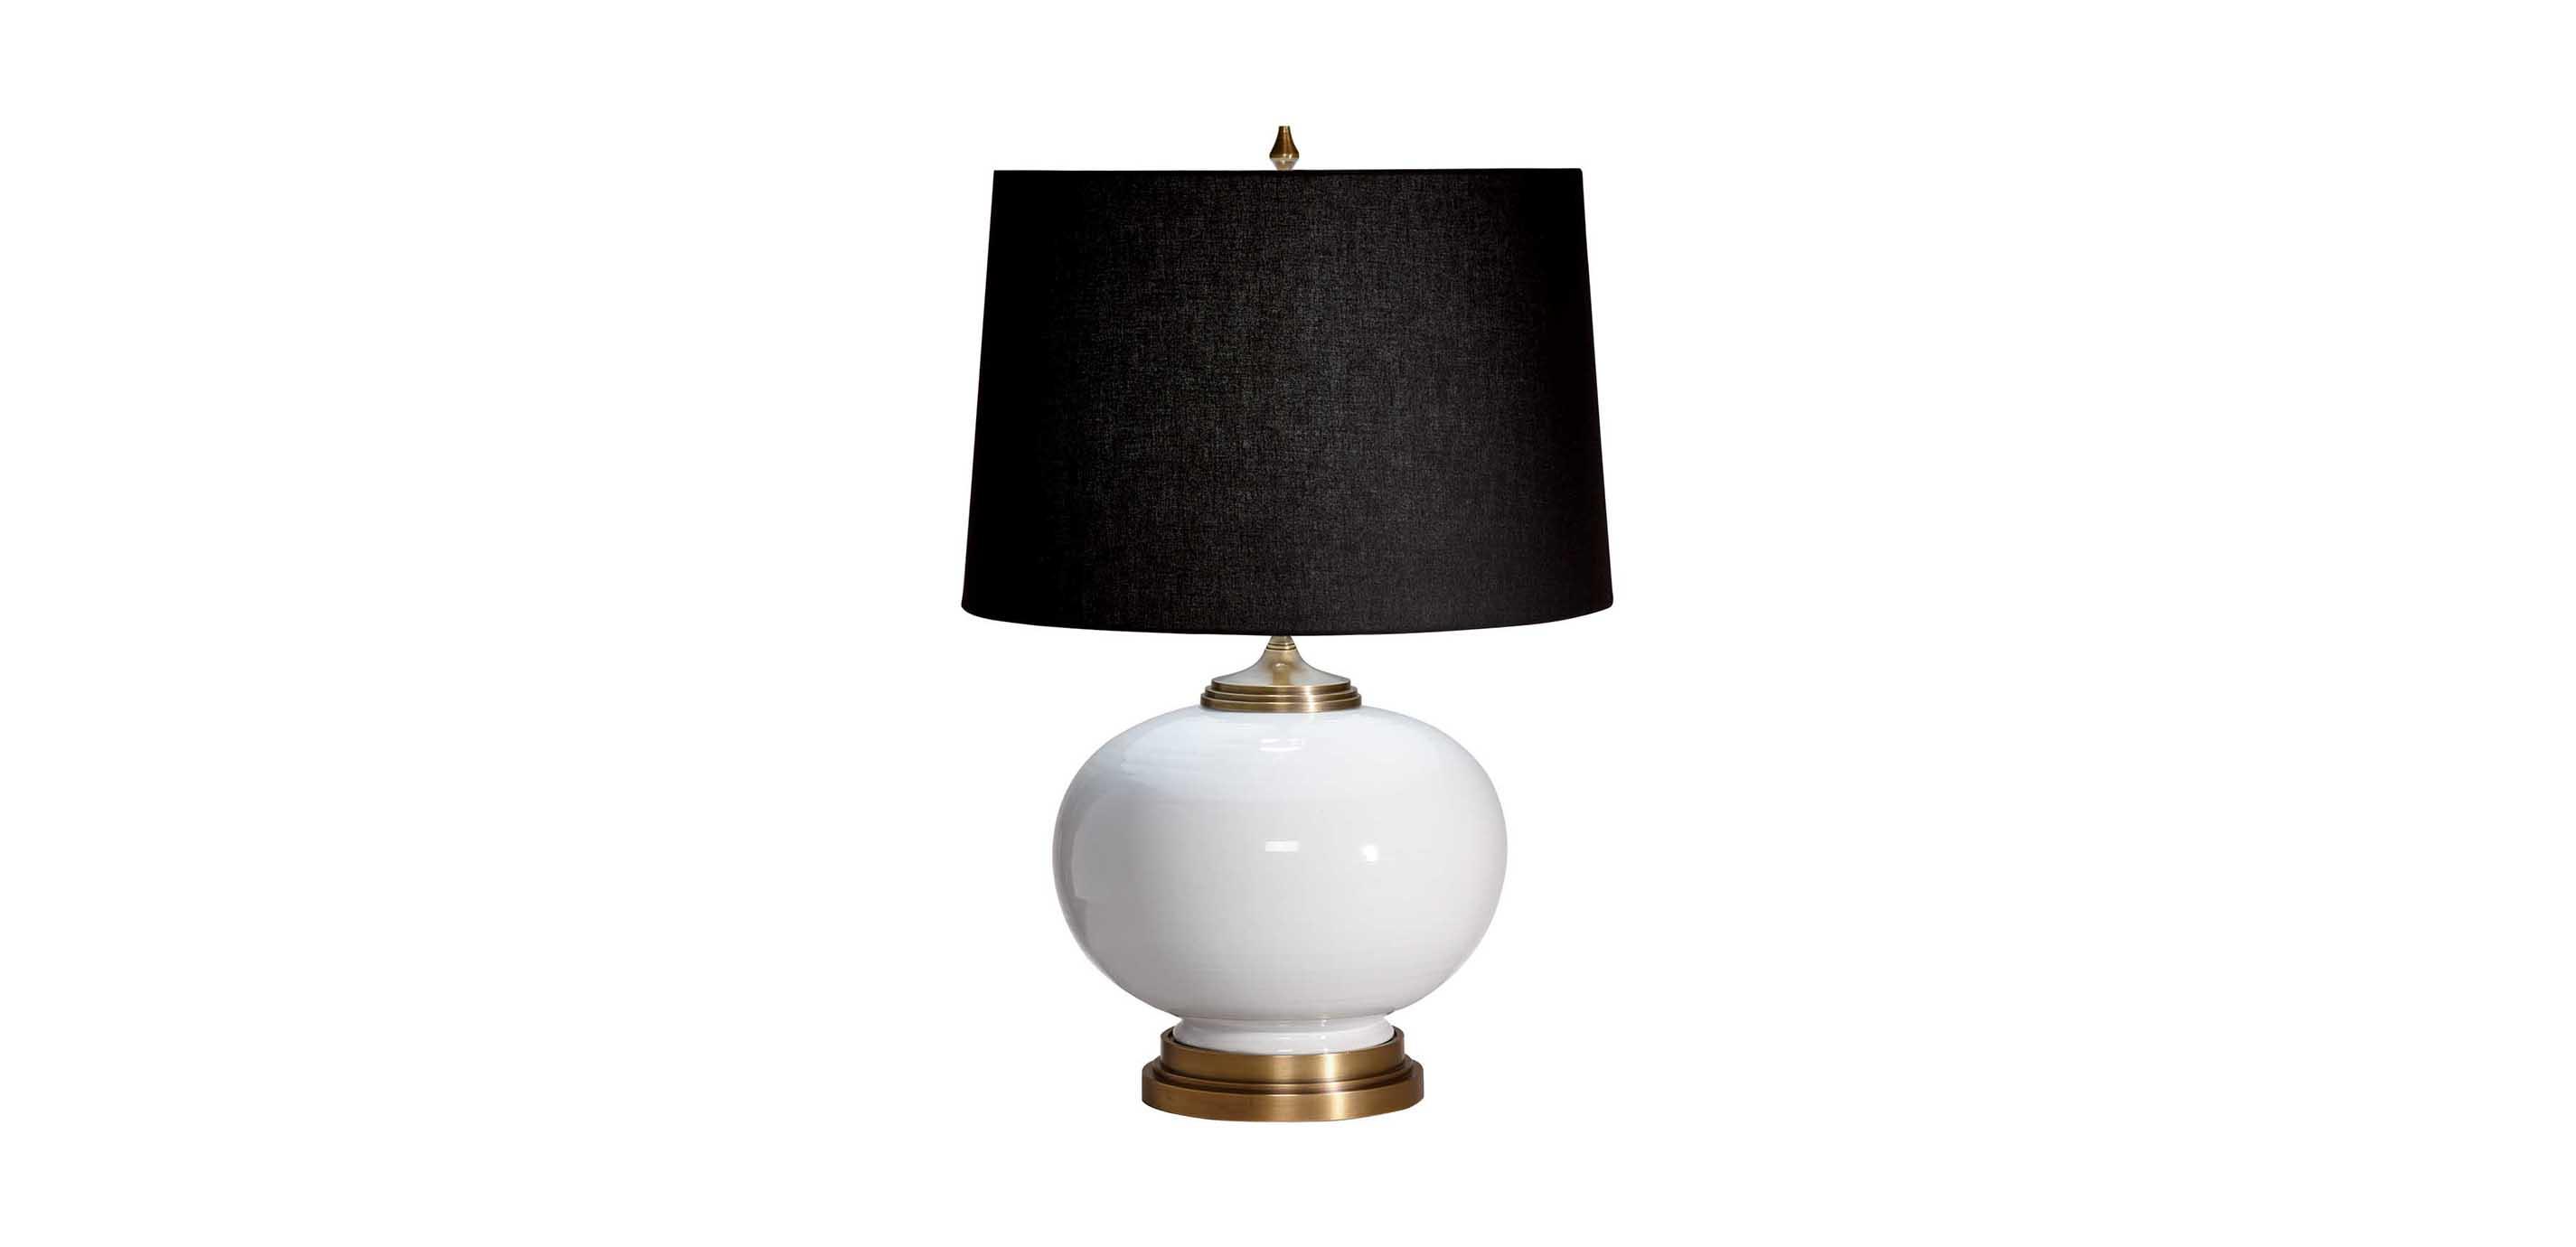 Kennington Table Lamp Lighting Ethan Allen